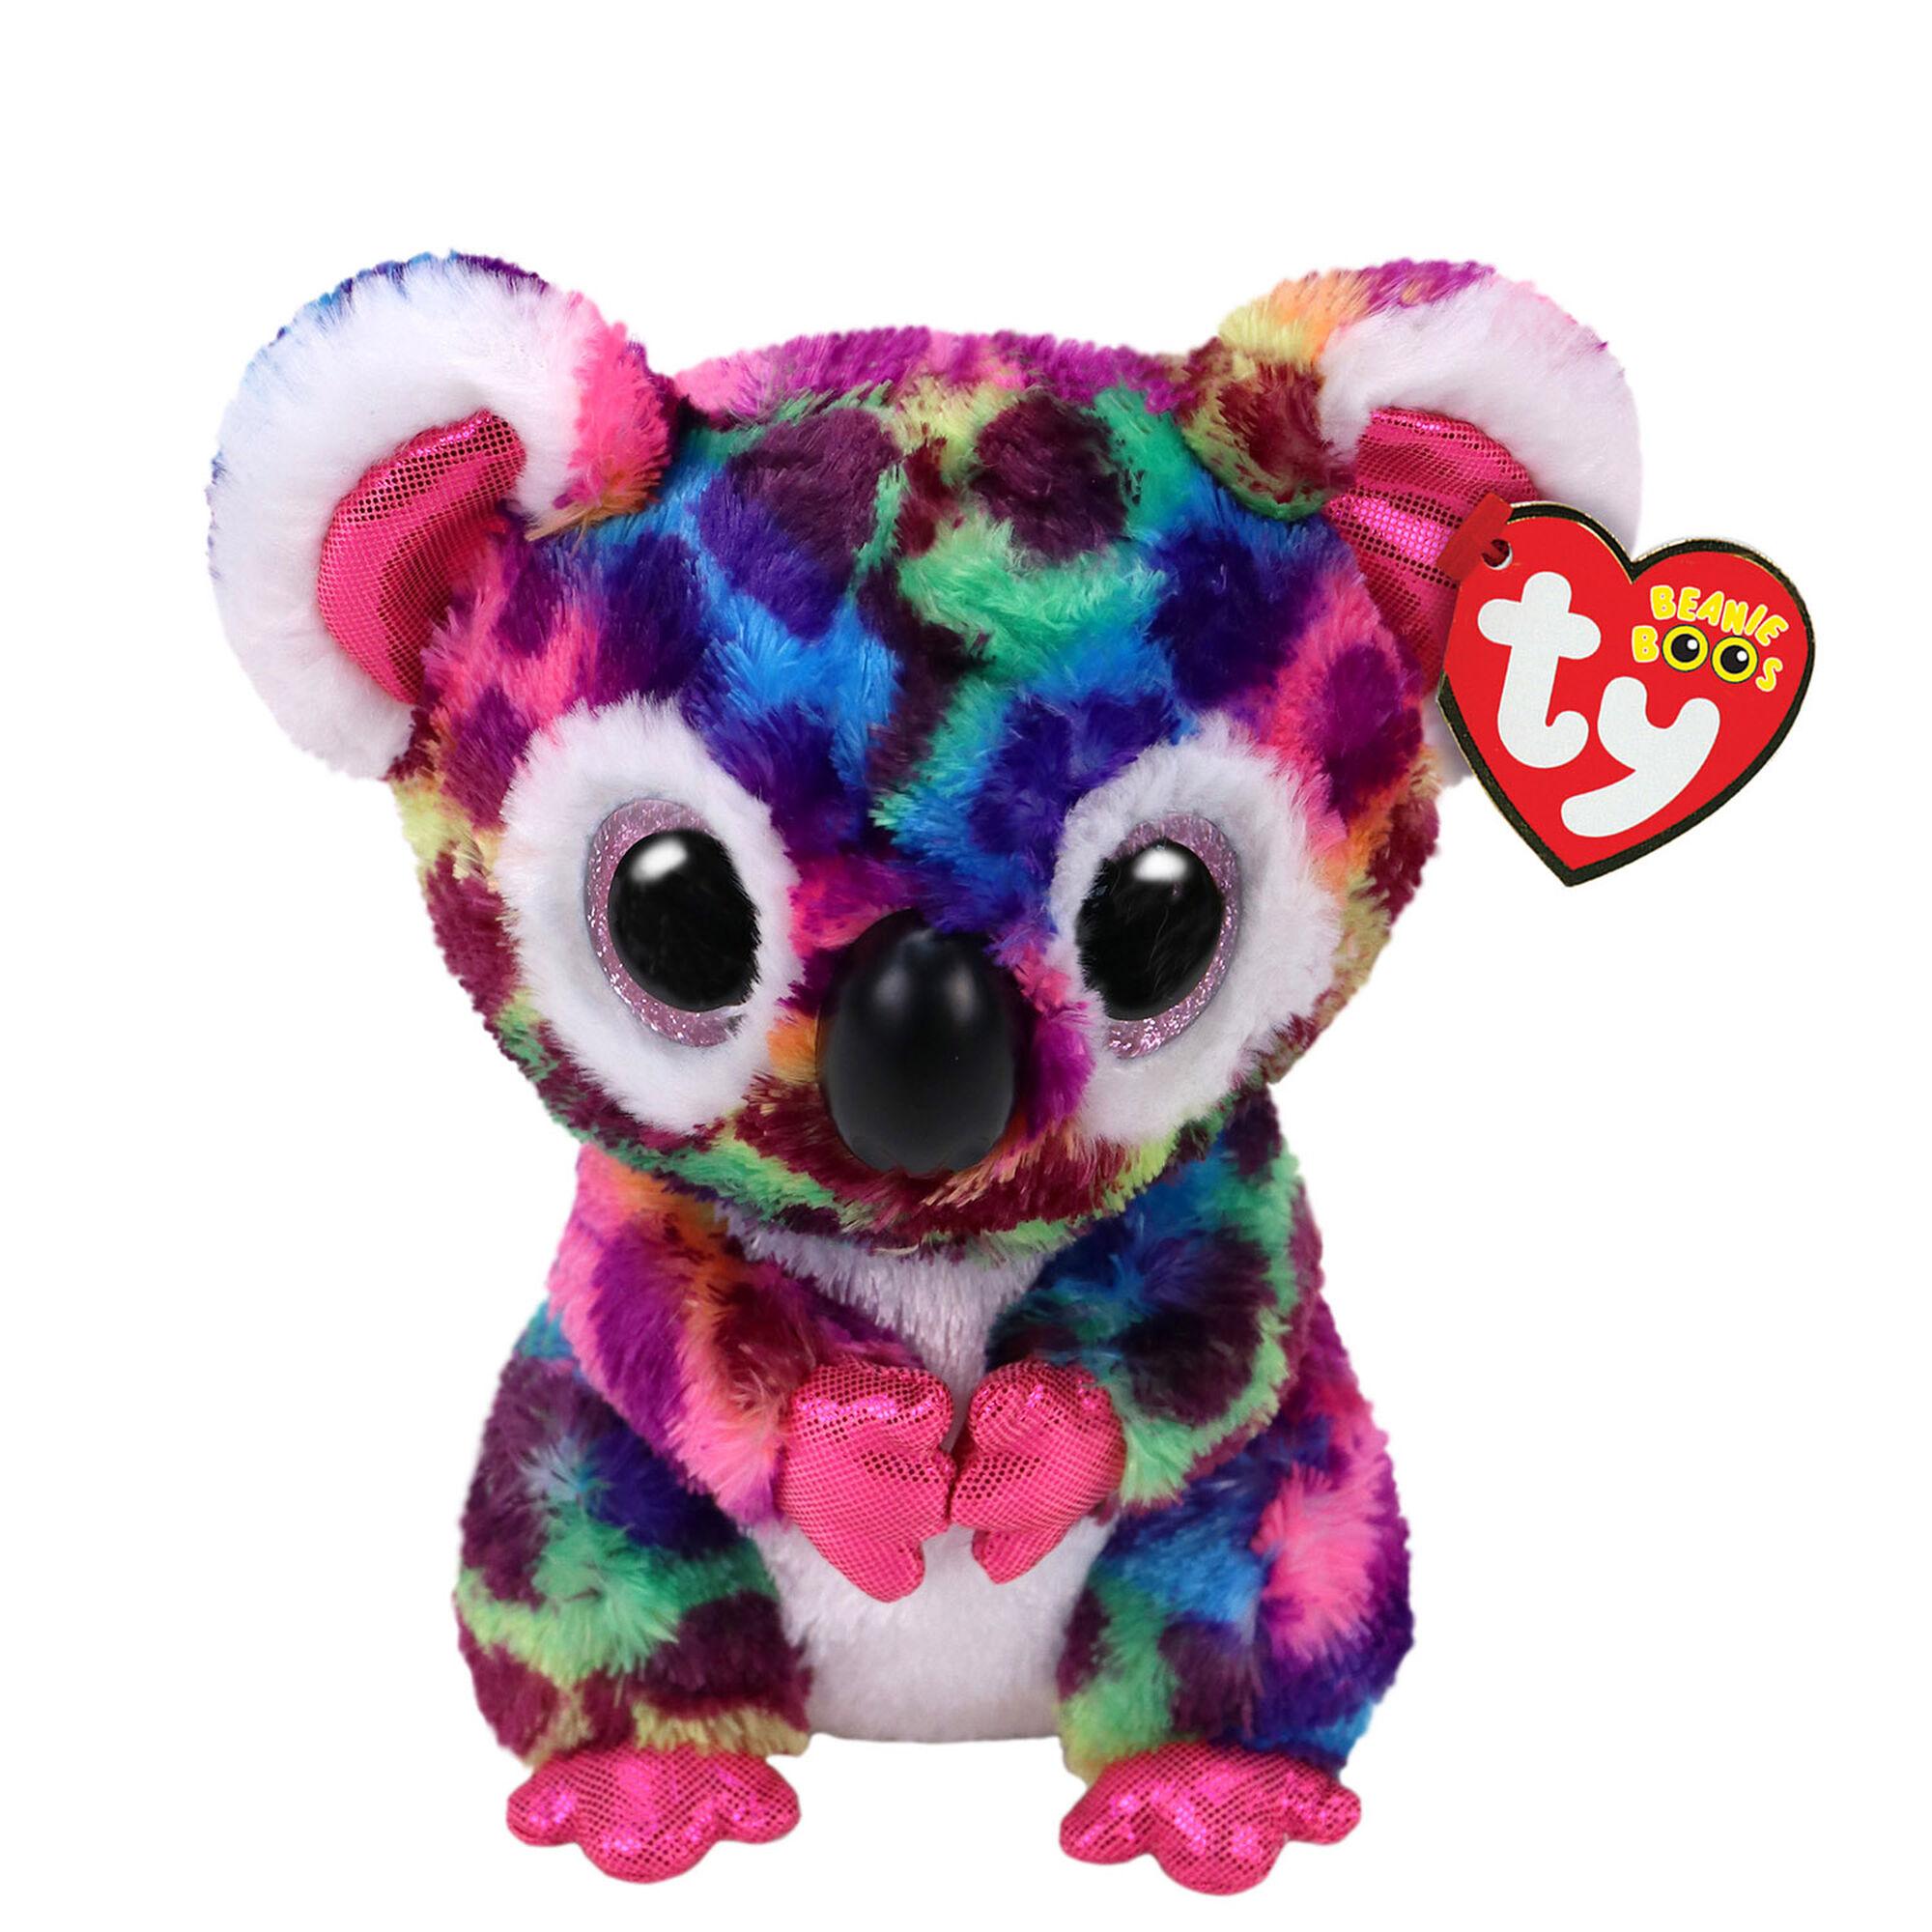 79d8e74559d ... Ty Beanie Boo Small Scout the Koala Bear Plush Toy